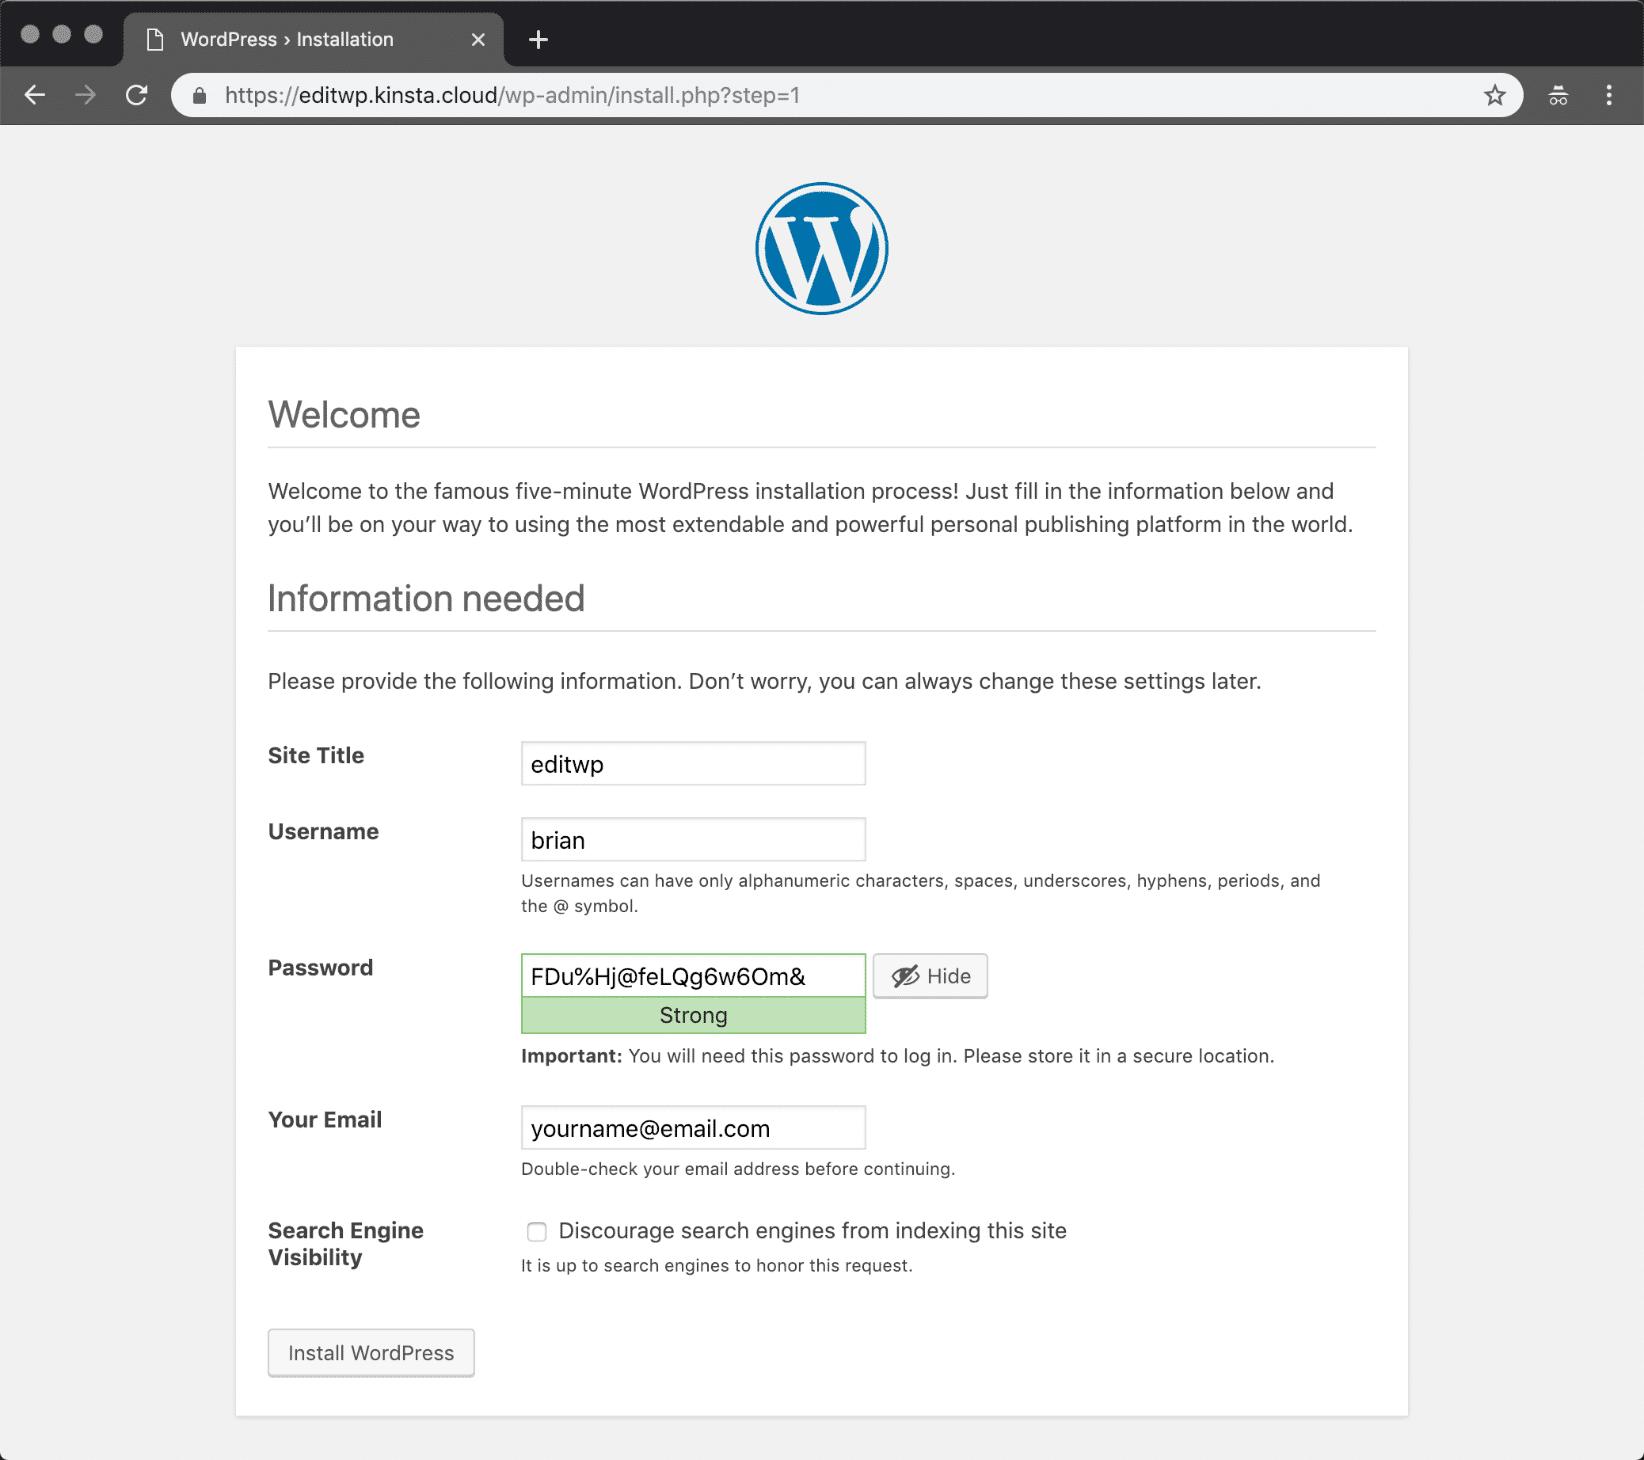 Installation manuelle de WordPress - Informations nécessaires